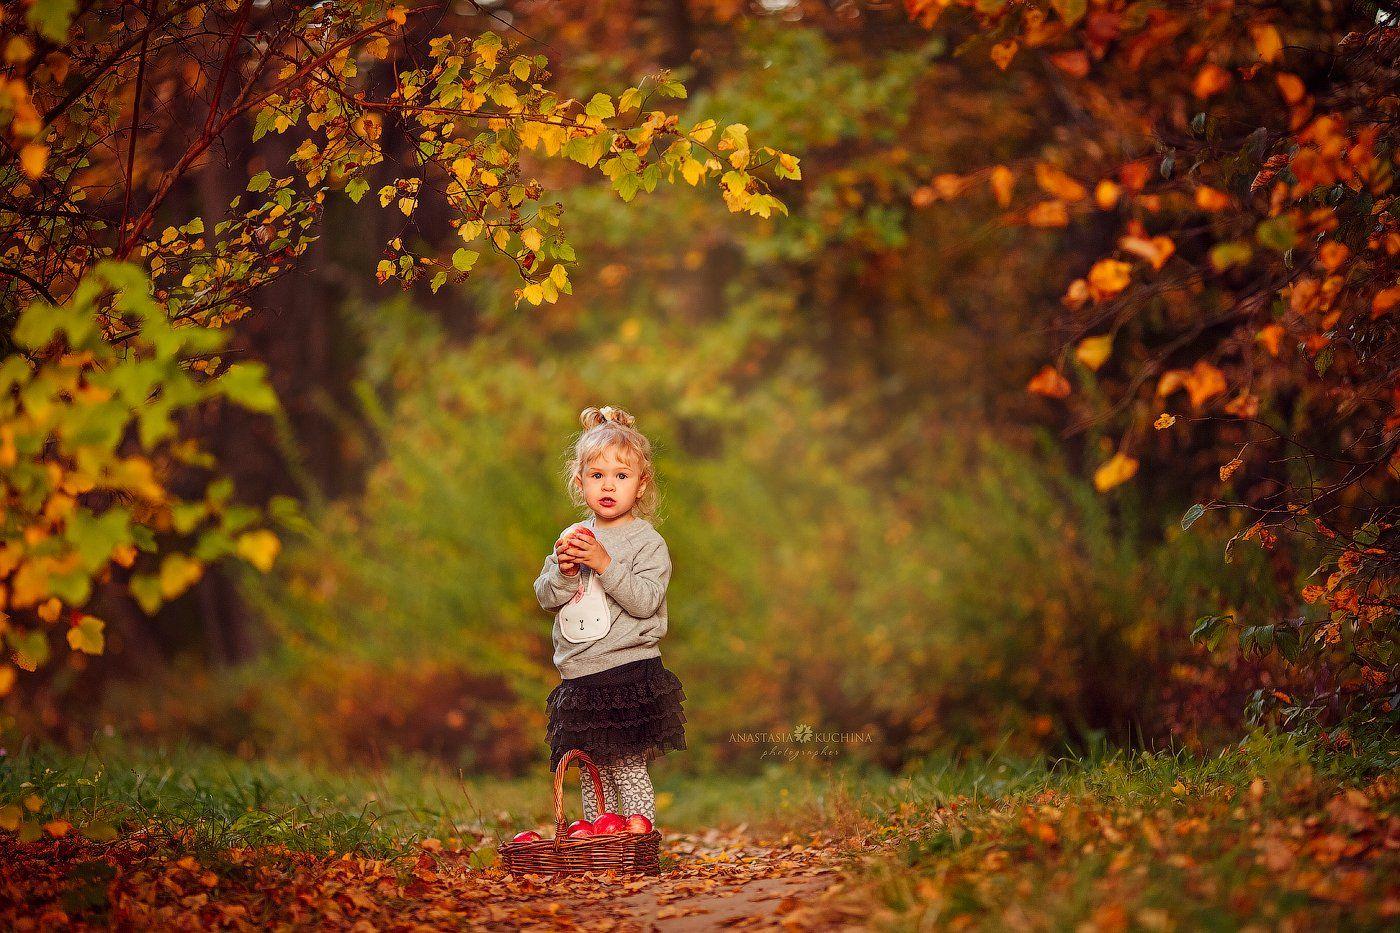 девочка, осень, прогулка, лес, Анастасия Кучина